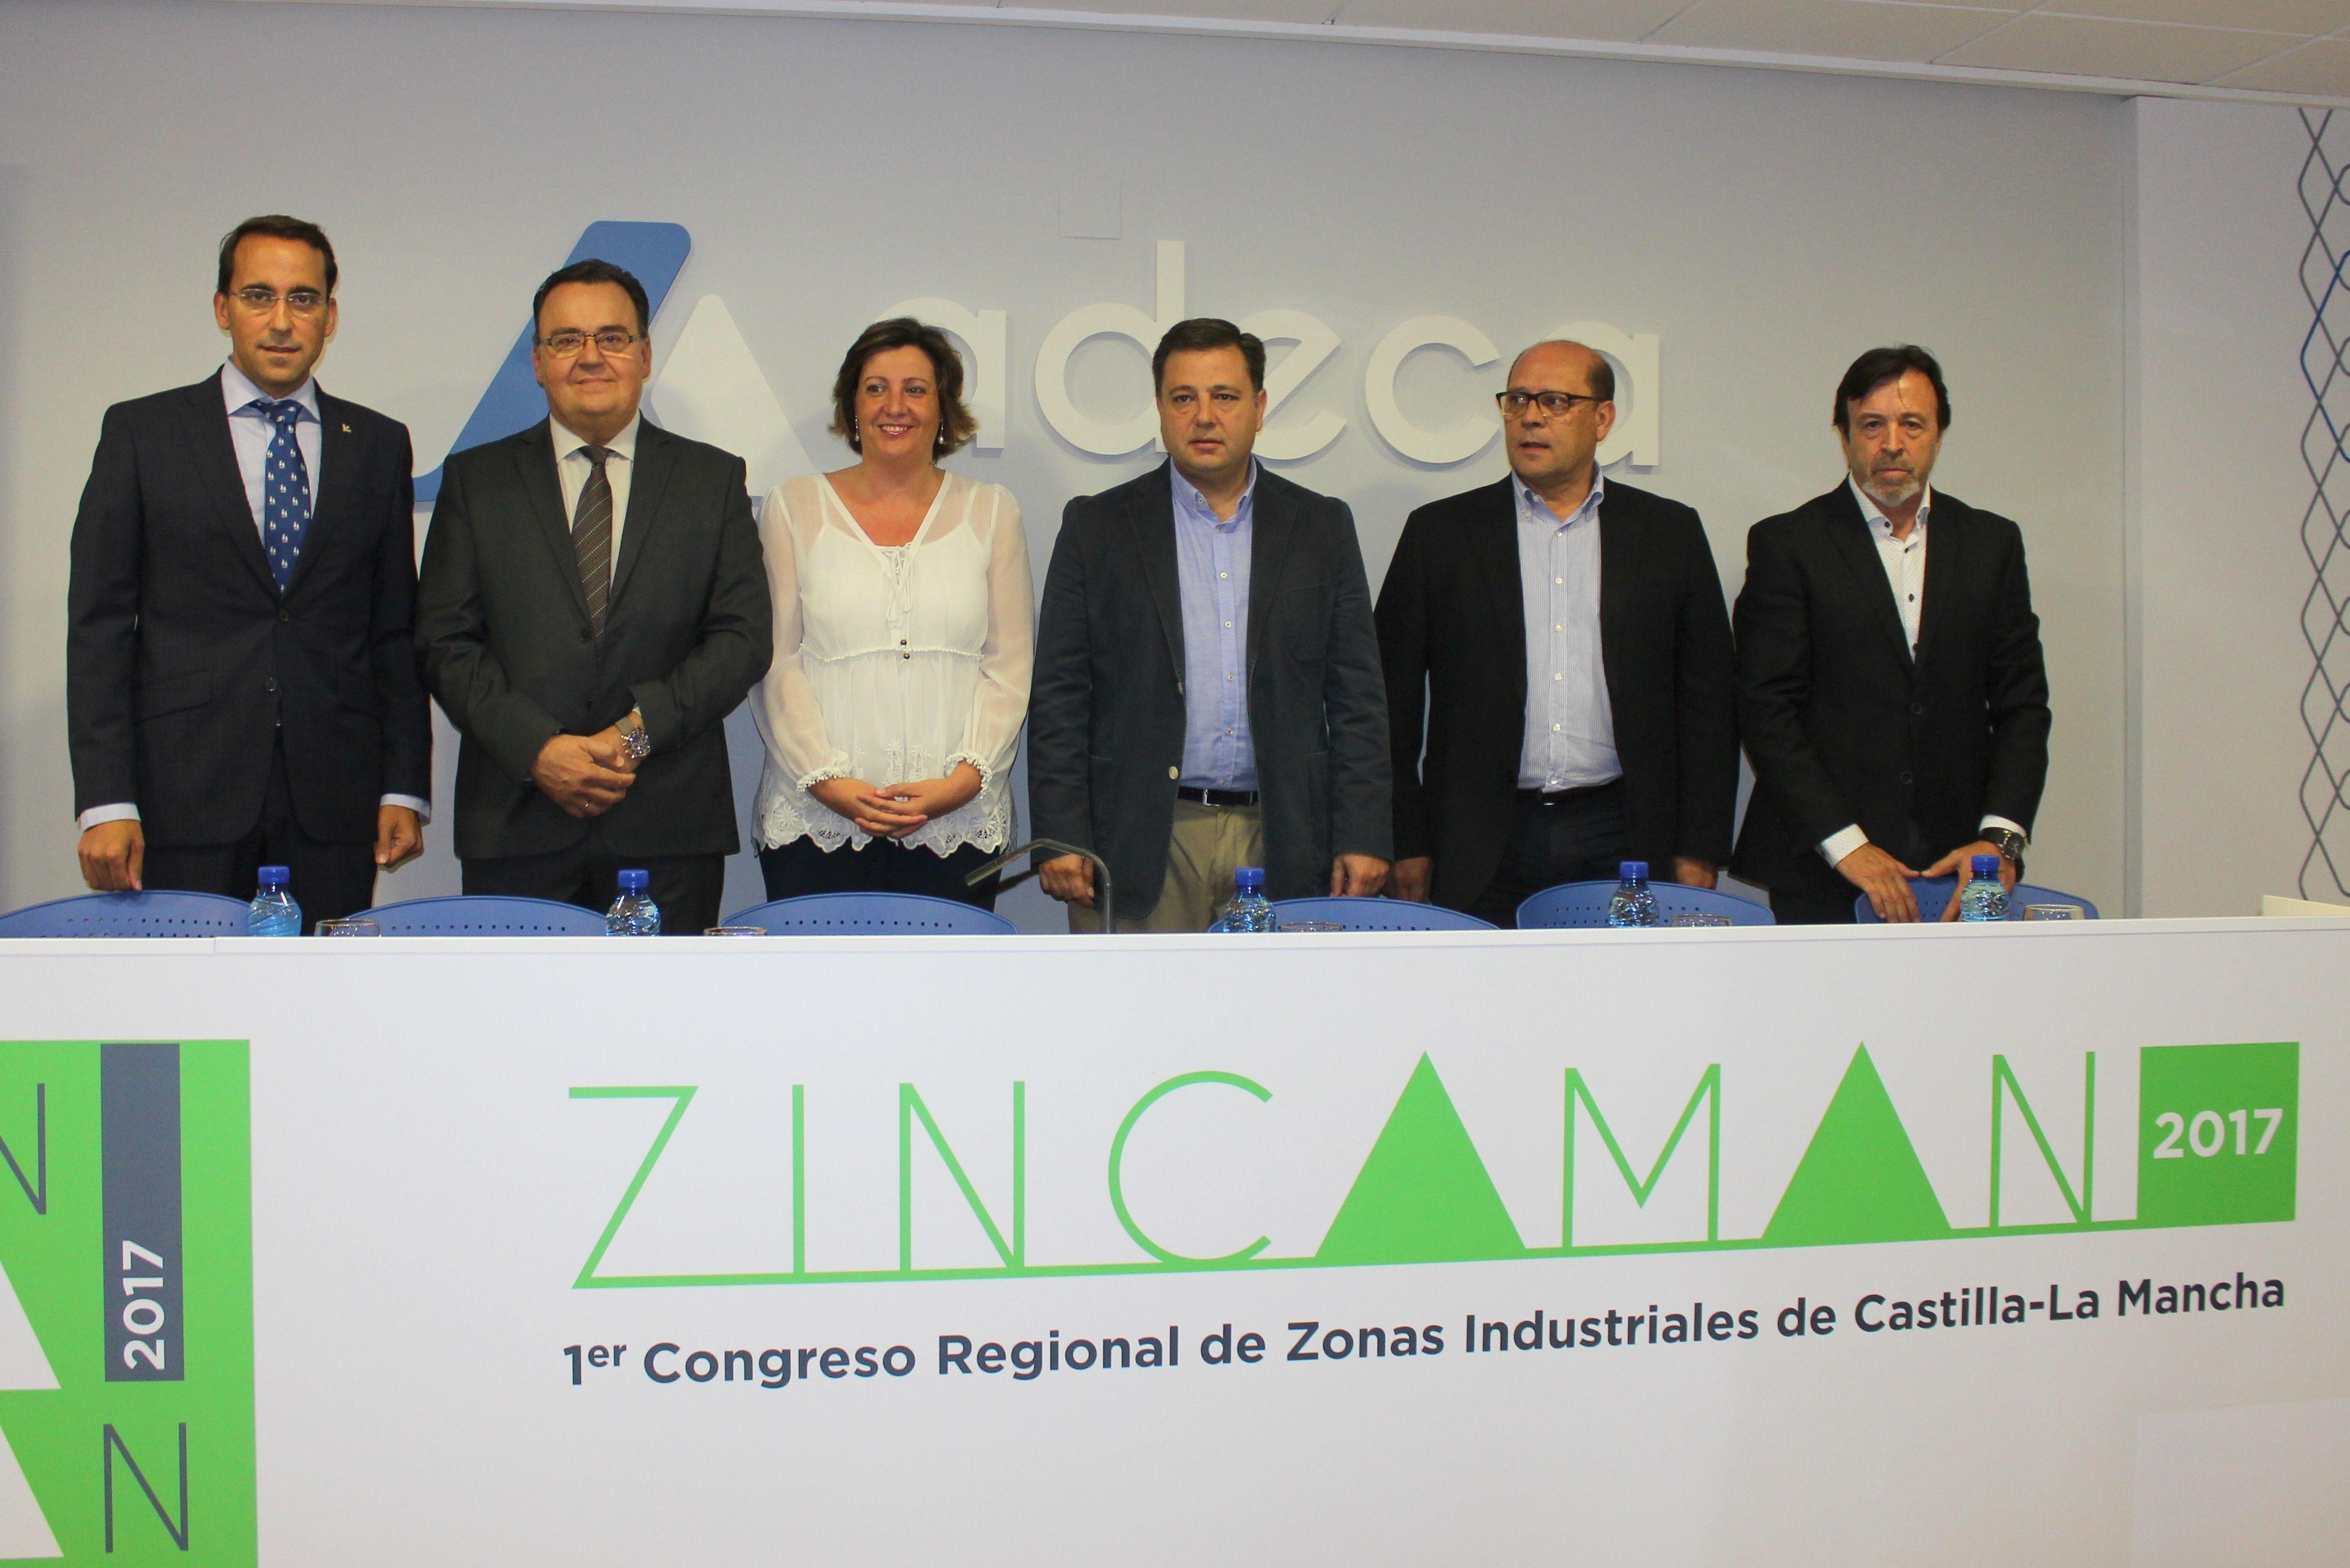 ZINCAMAN 2